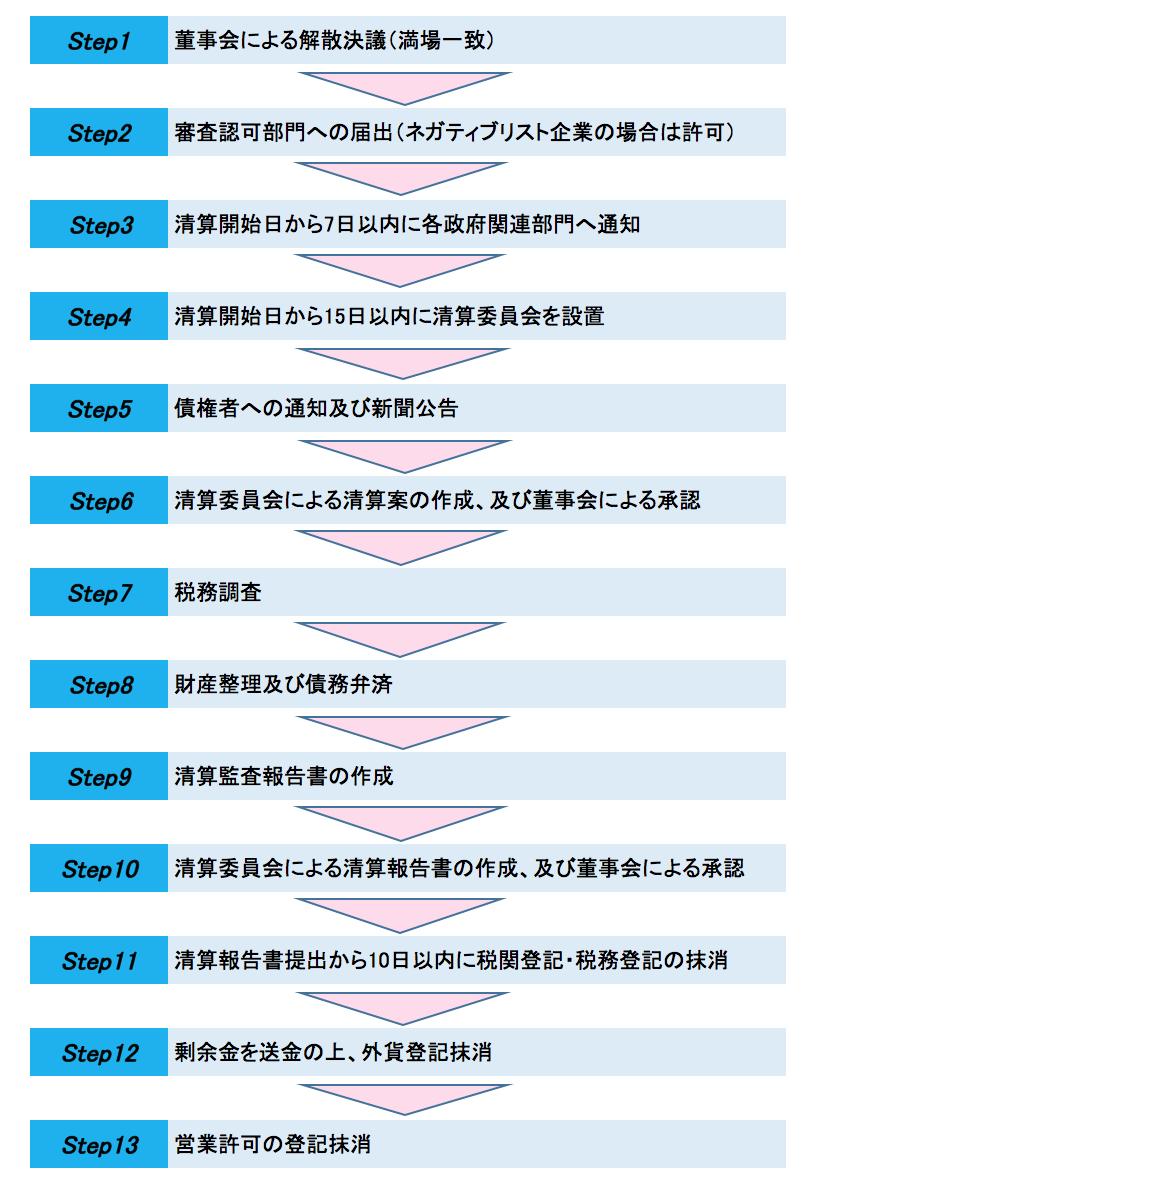 中国 撤退手続フロー